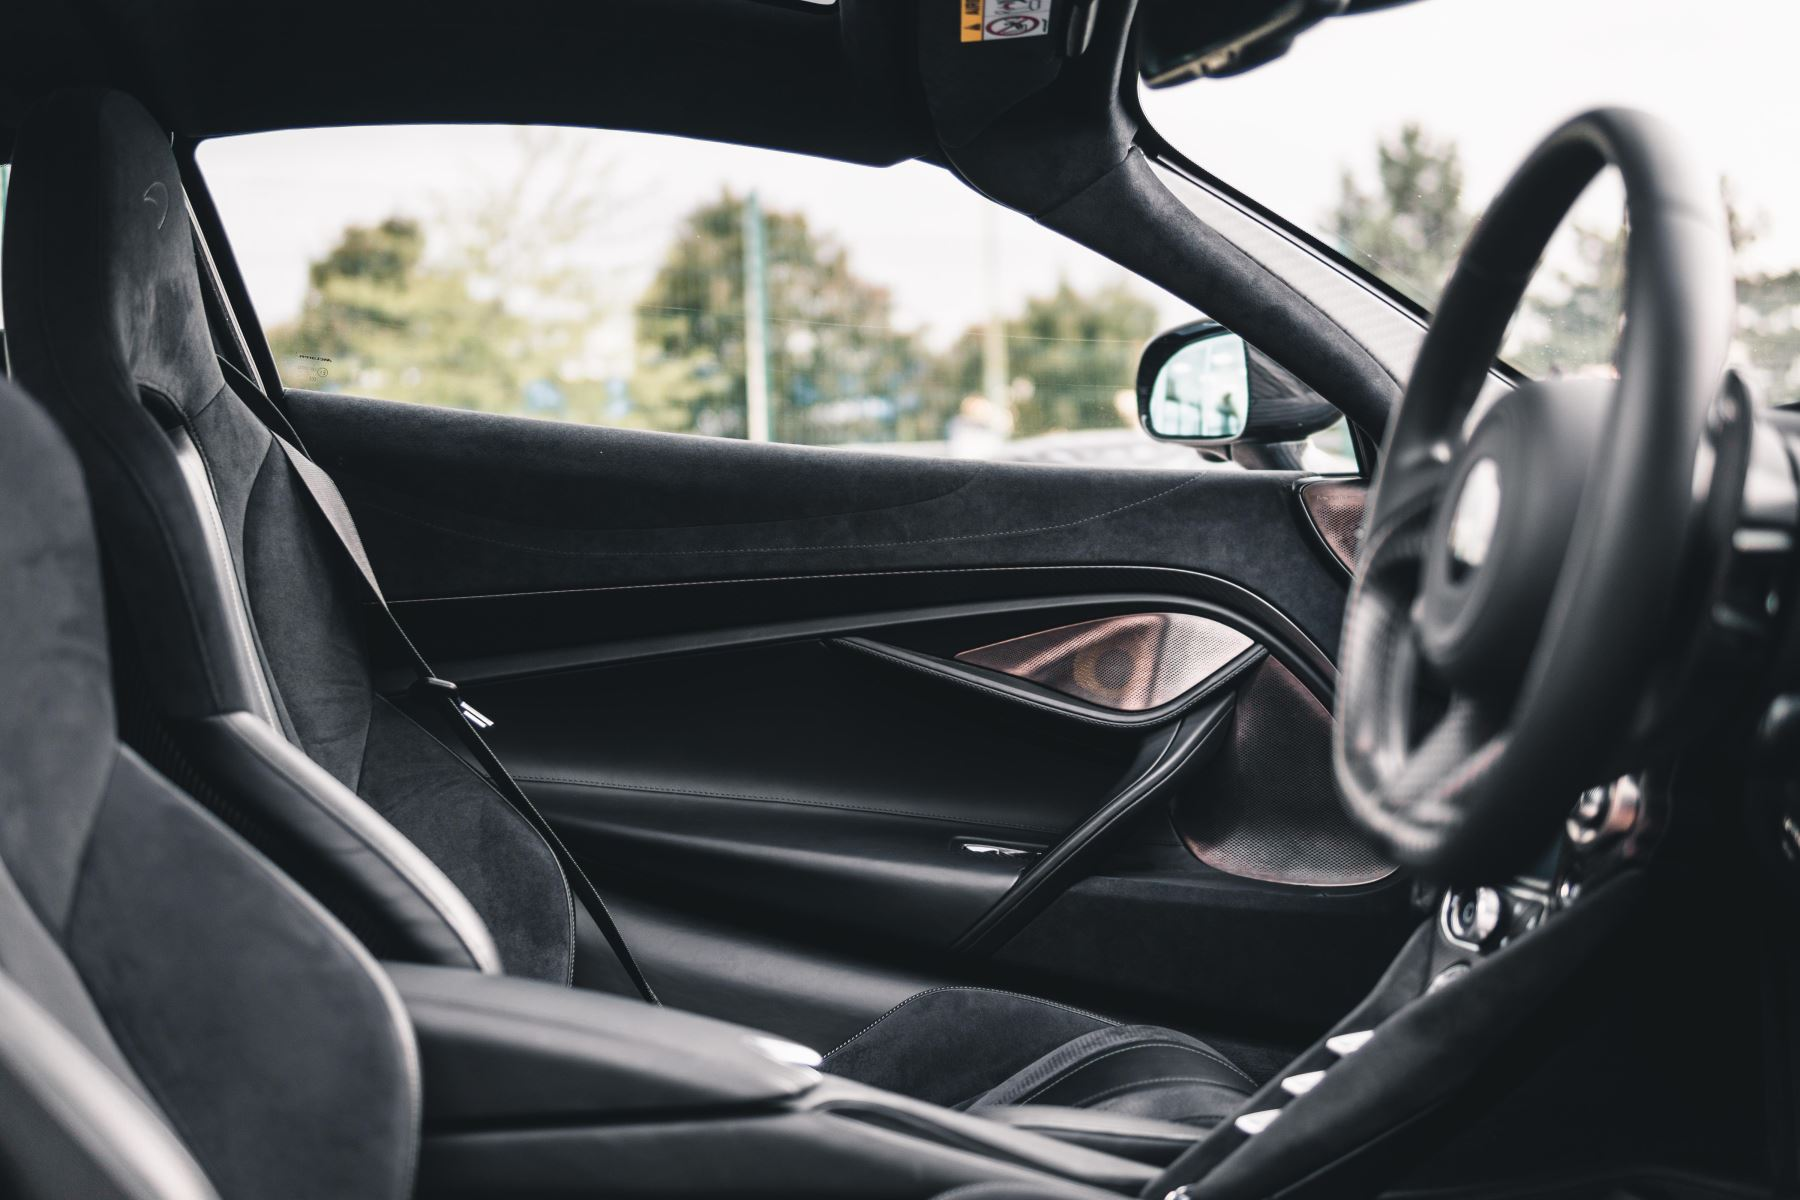 McLaren 720S Performance V8 Coupe SSG image 60